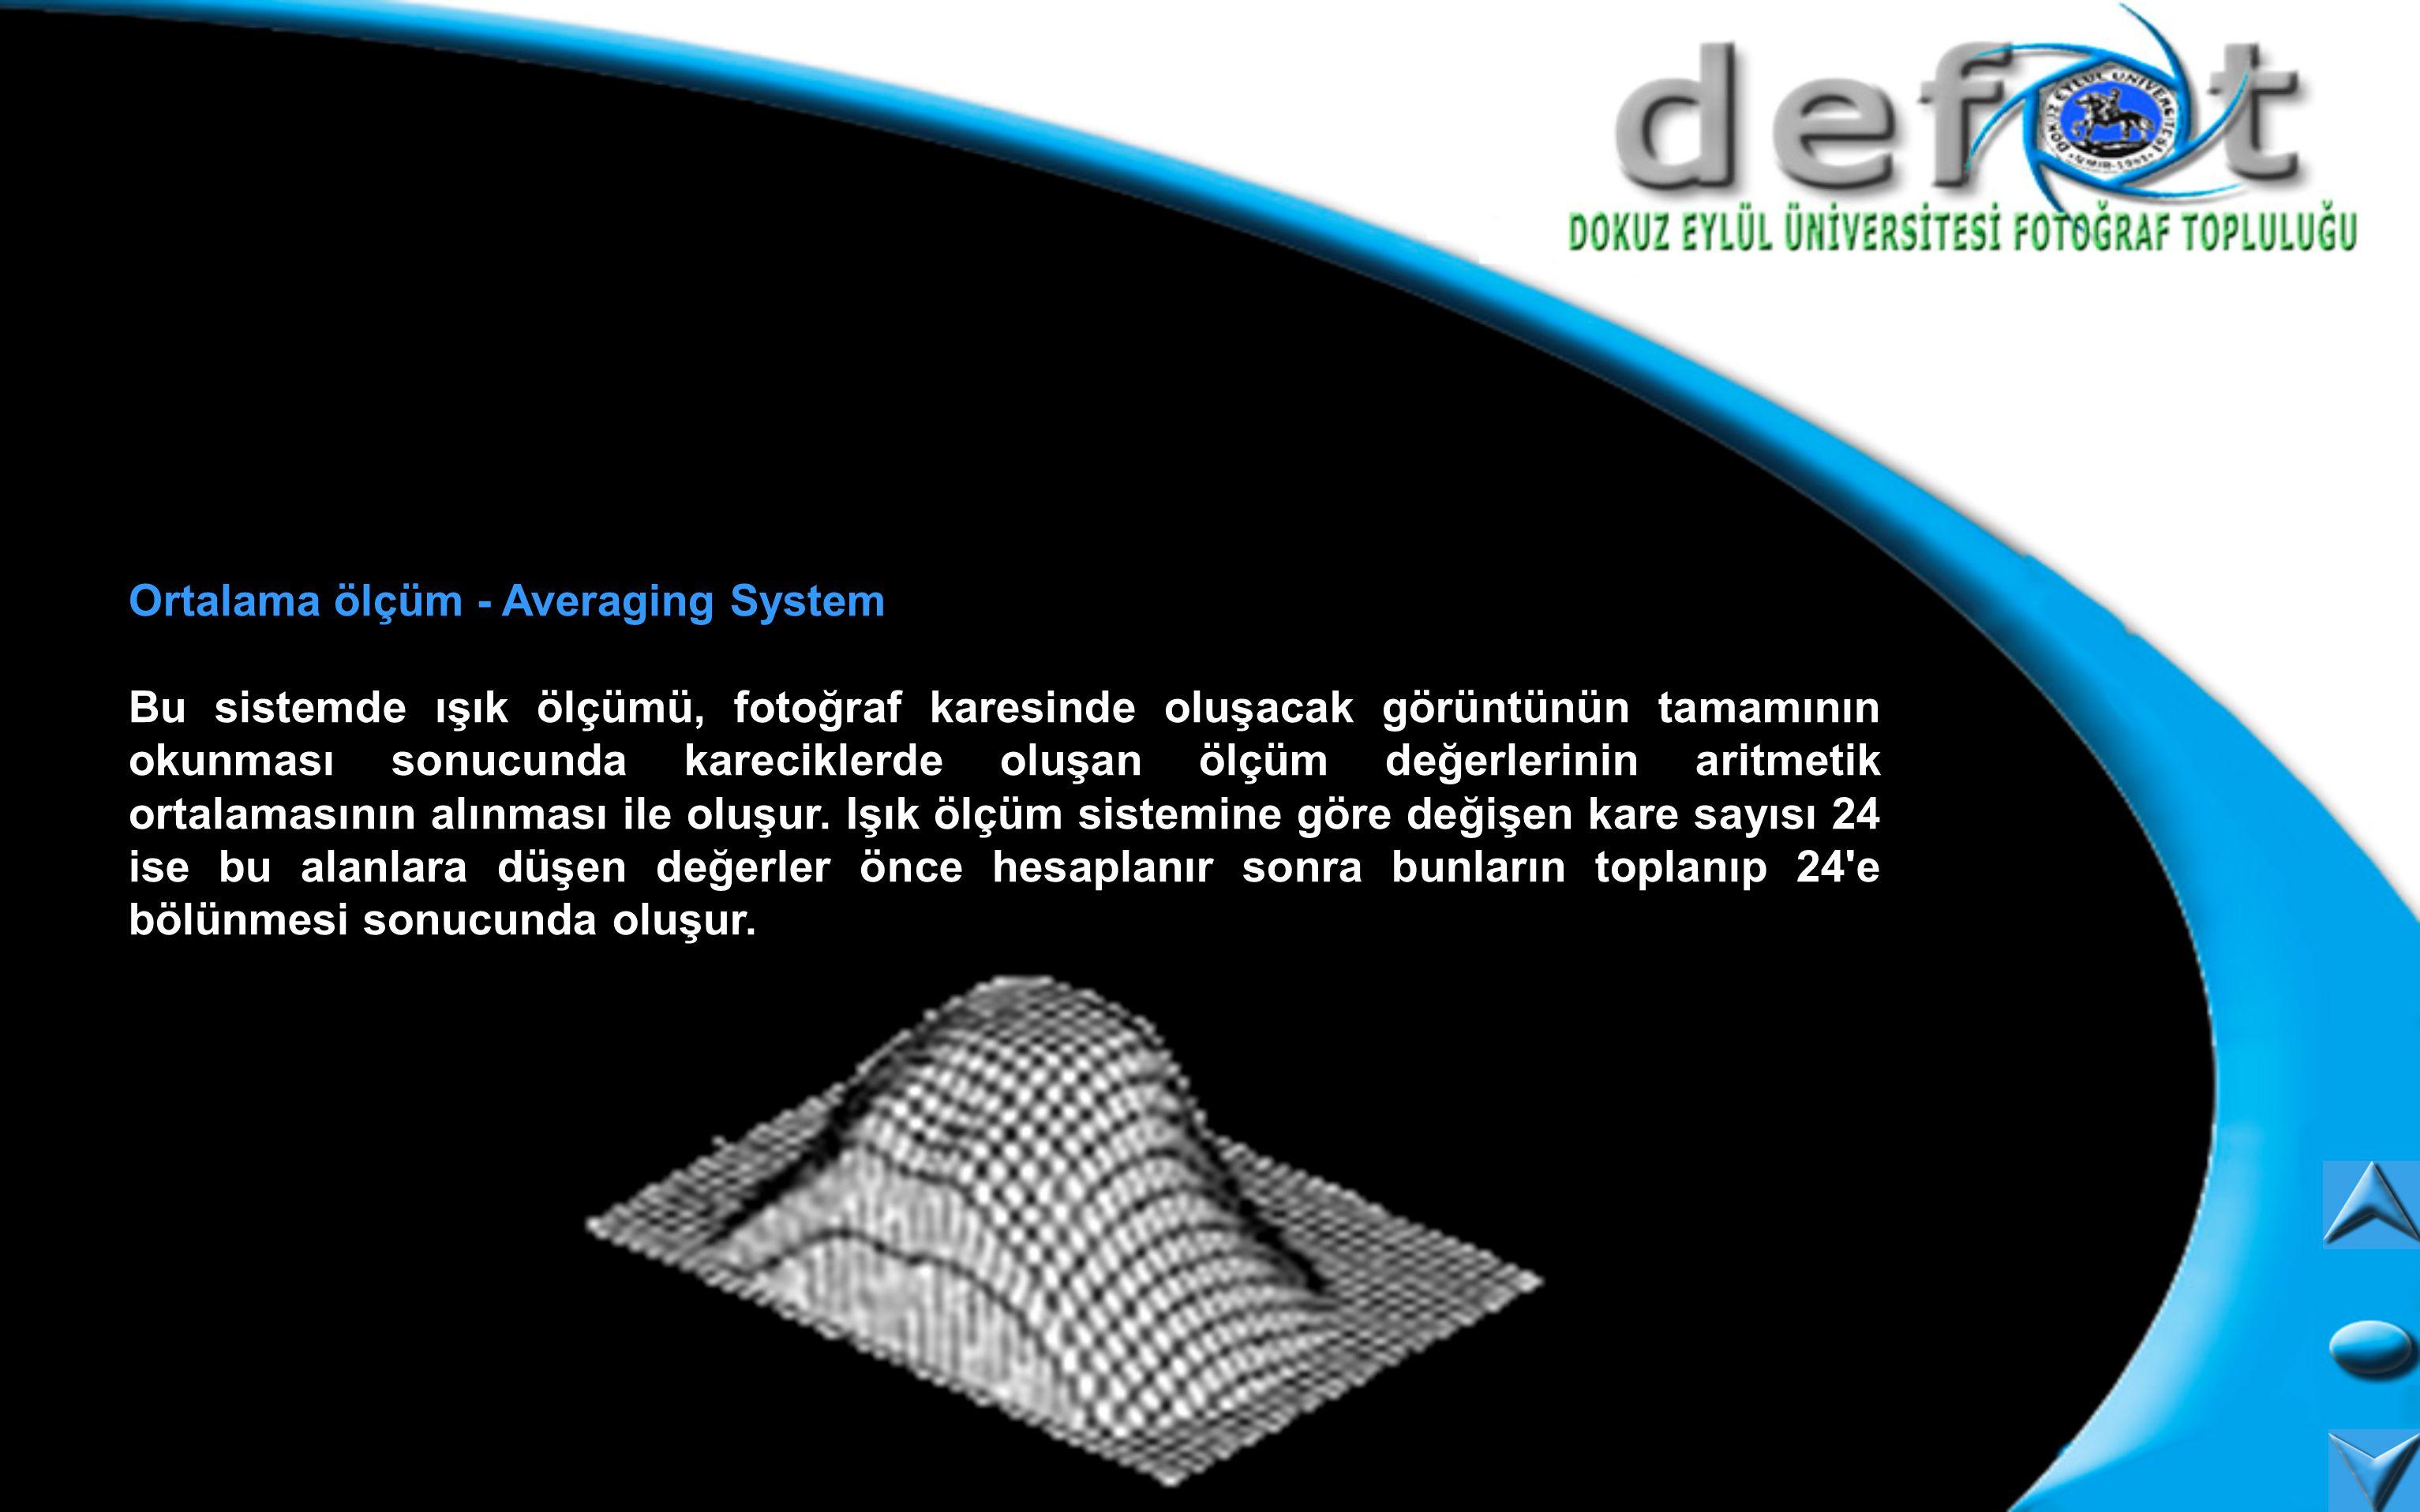 Ortalama ölçüm - Averaging System